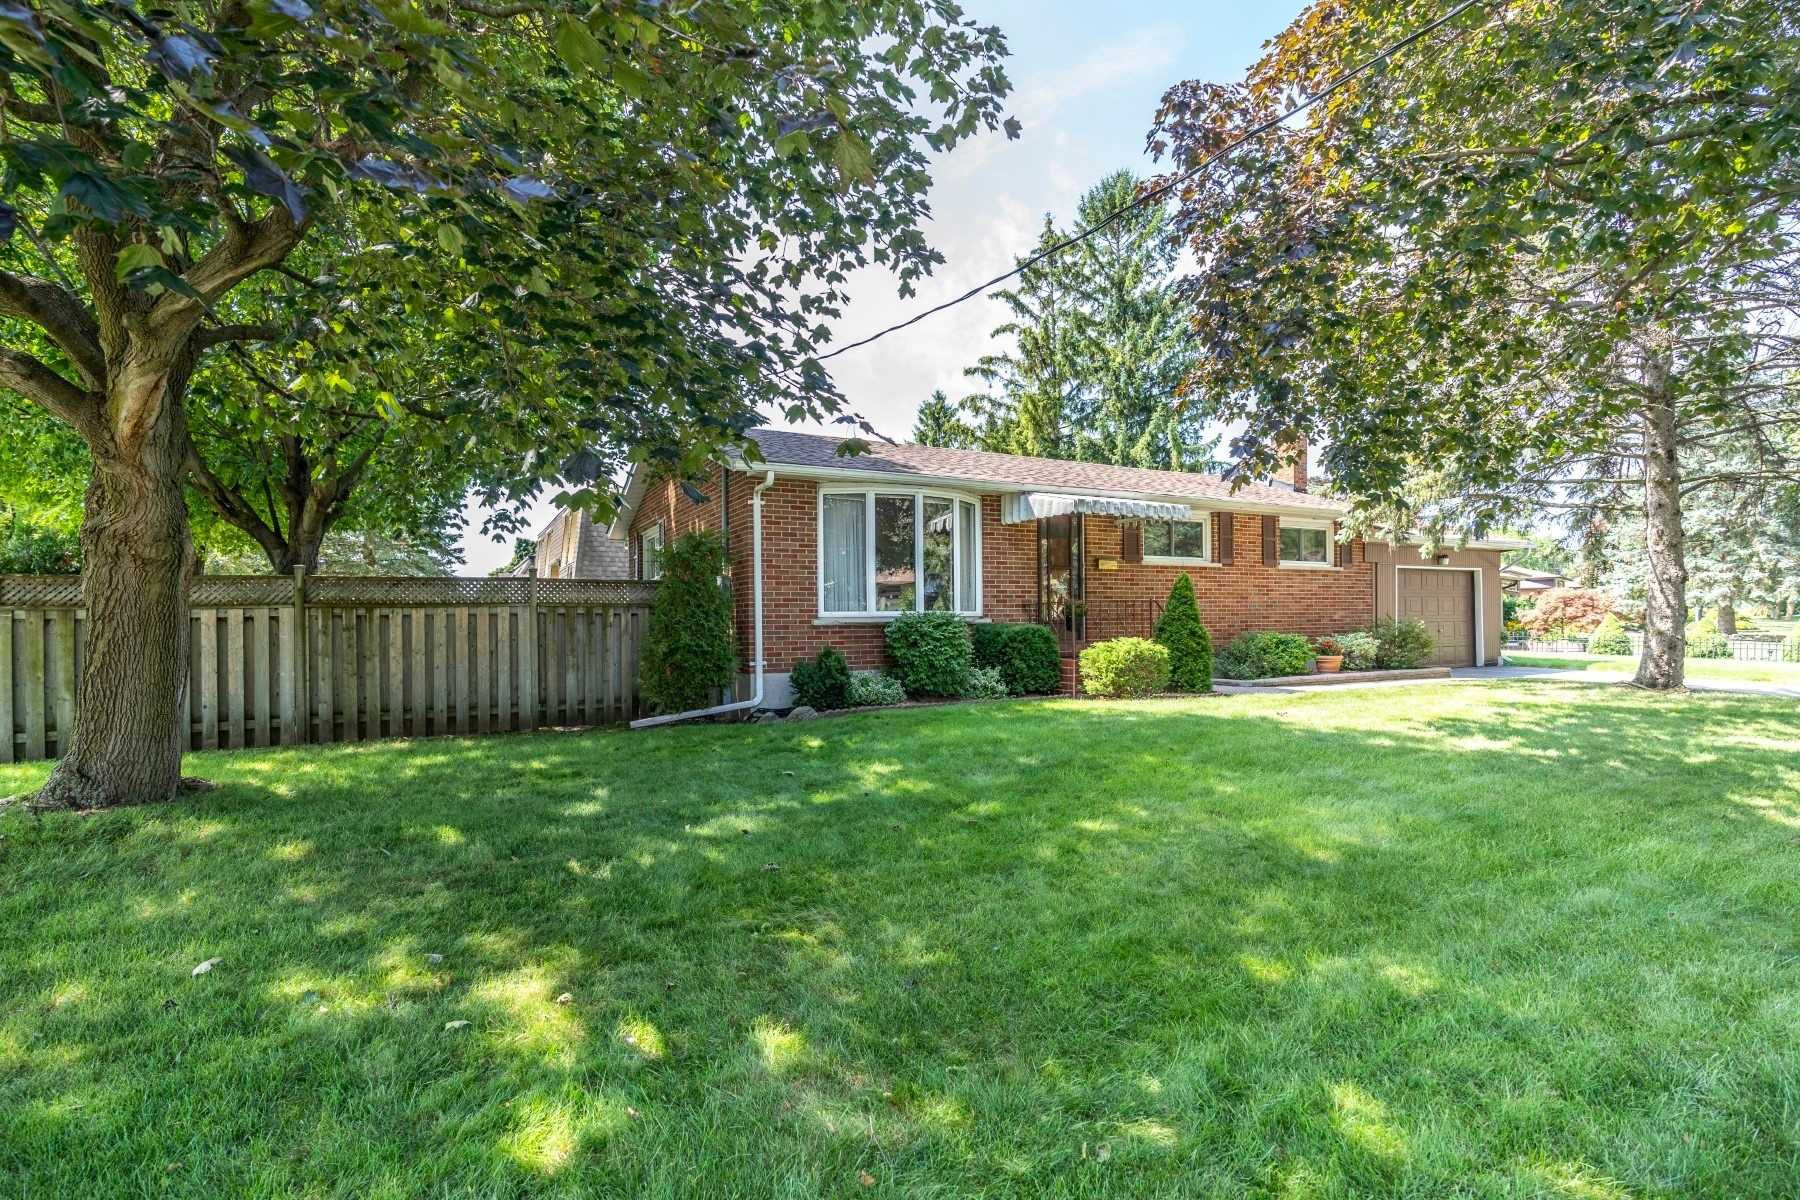 Photo 17: Photos: 1140 Northridge Street in Oshawa: Centennial House (Bungalow) for sale : MLS®# E4571459